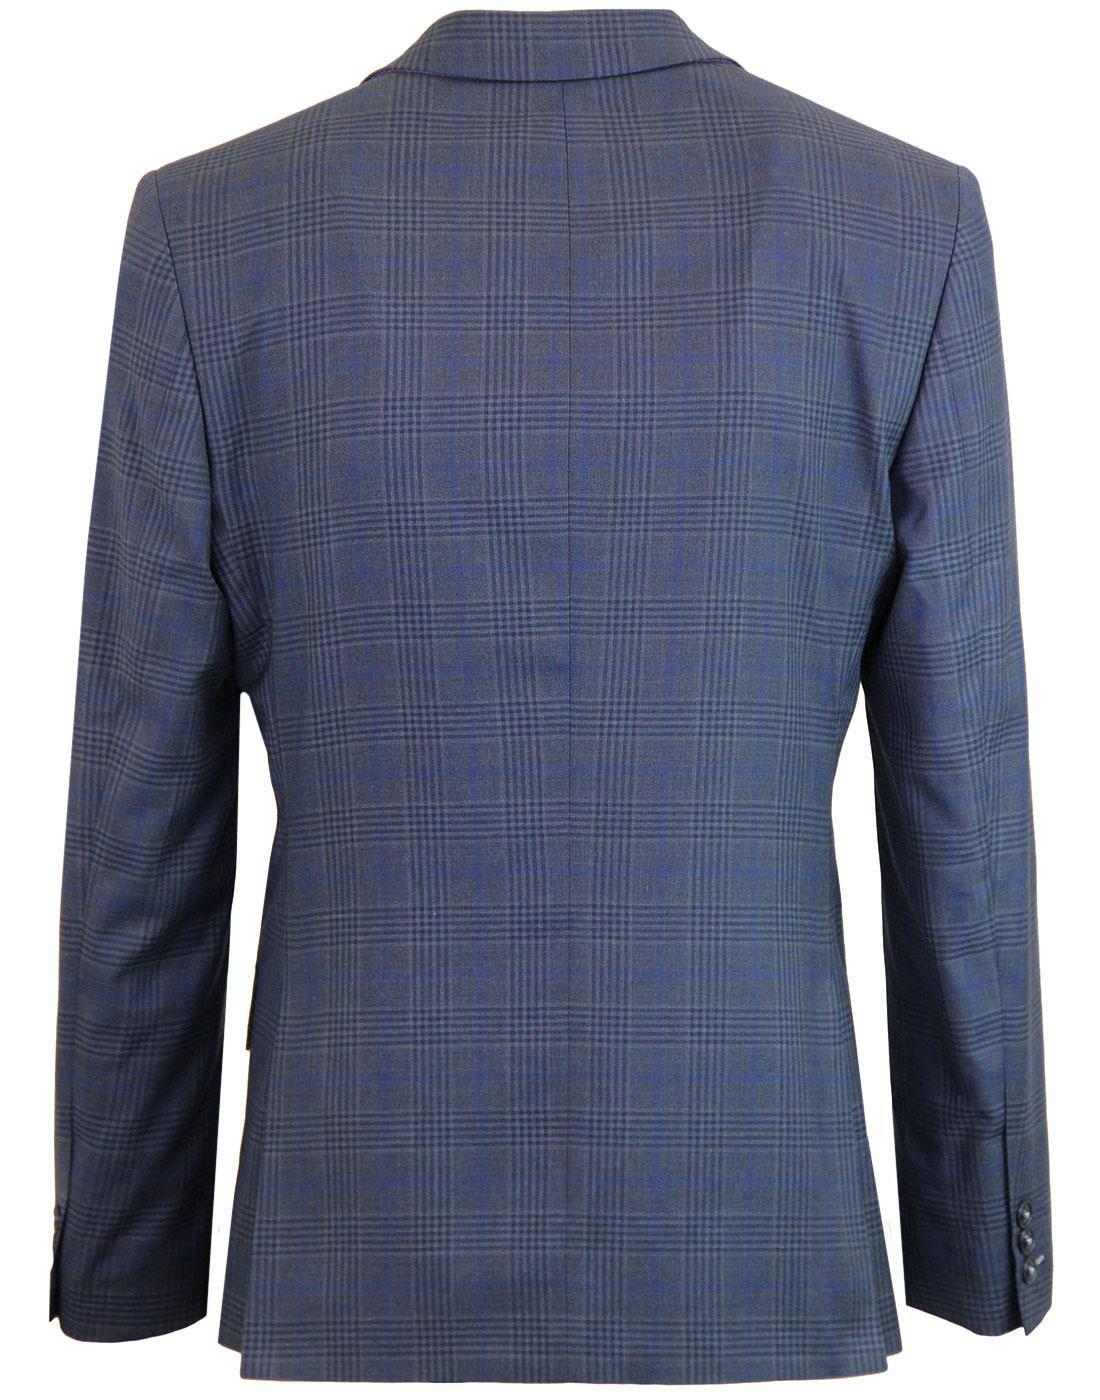 ANTIQUE ROGUE Retro 60s Mod Check Blazer Jacket in Blue